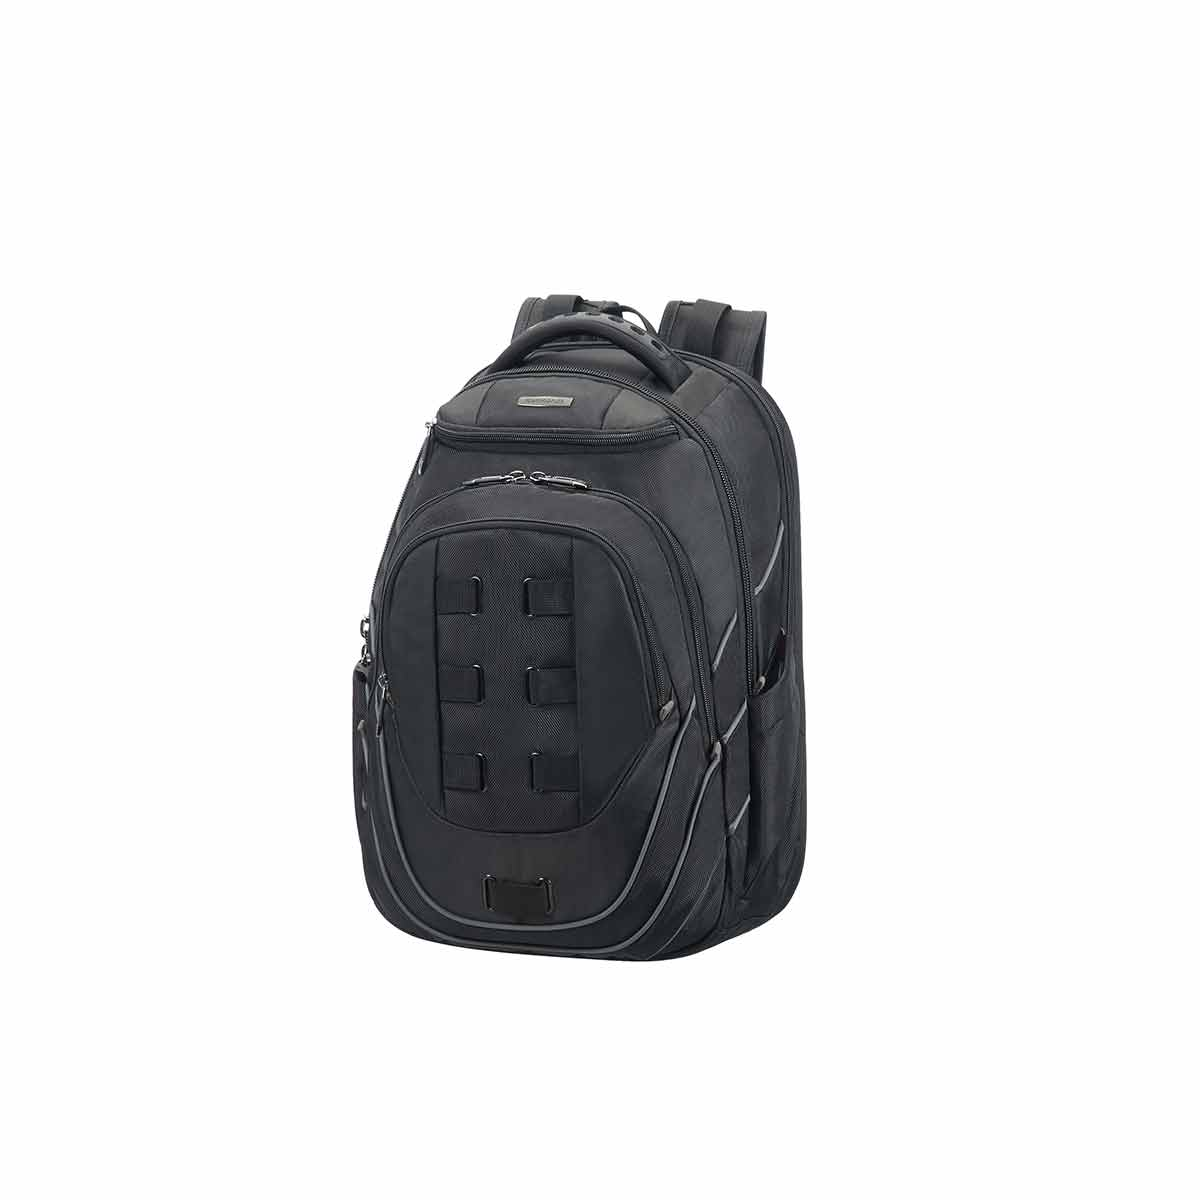 samsonite leviathan laptop backpack 17.3 inch, black/grey